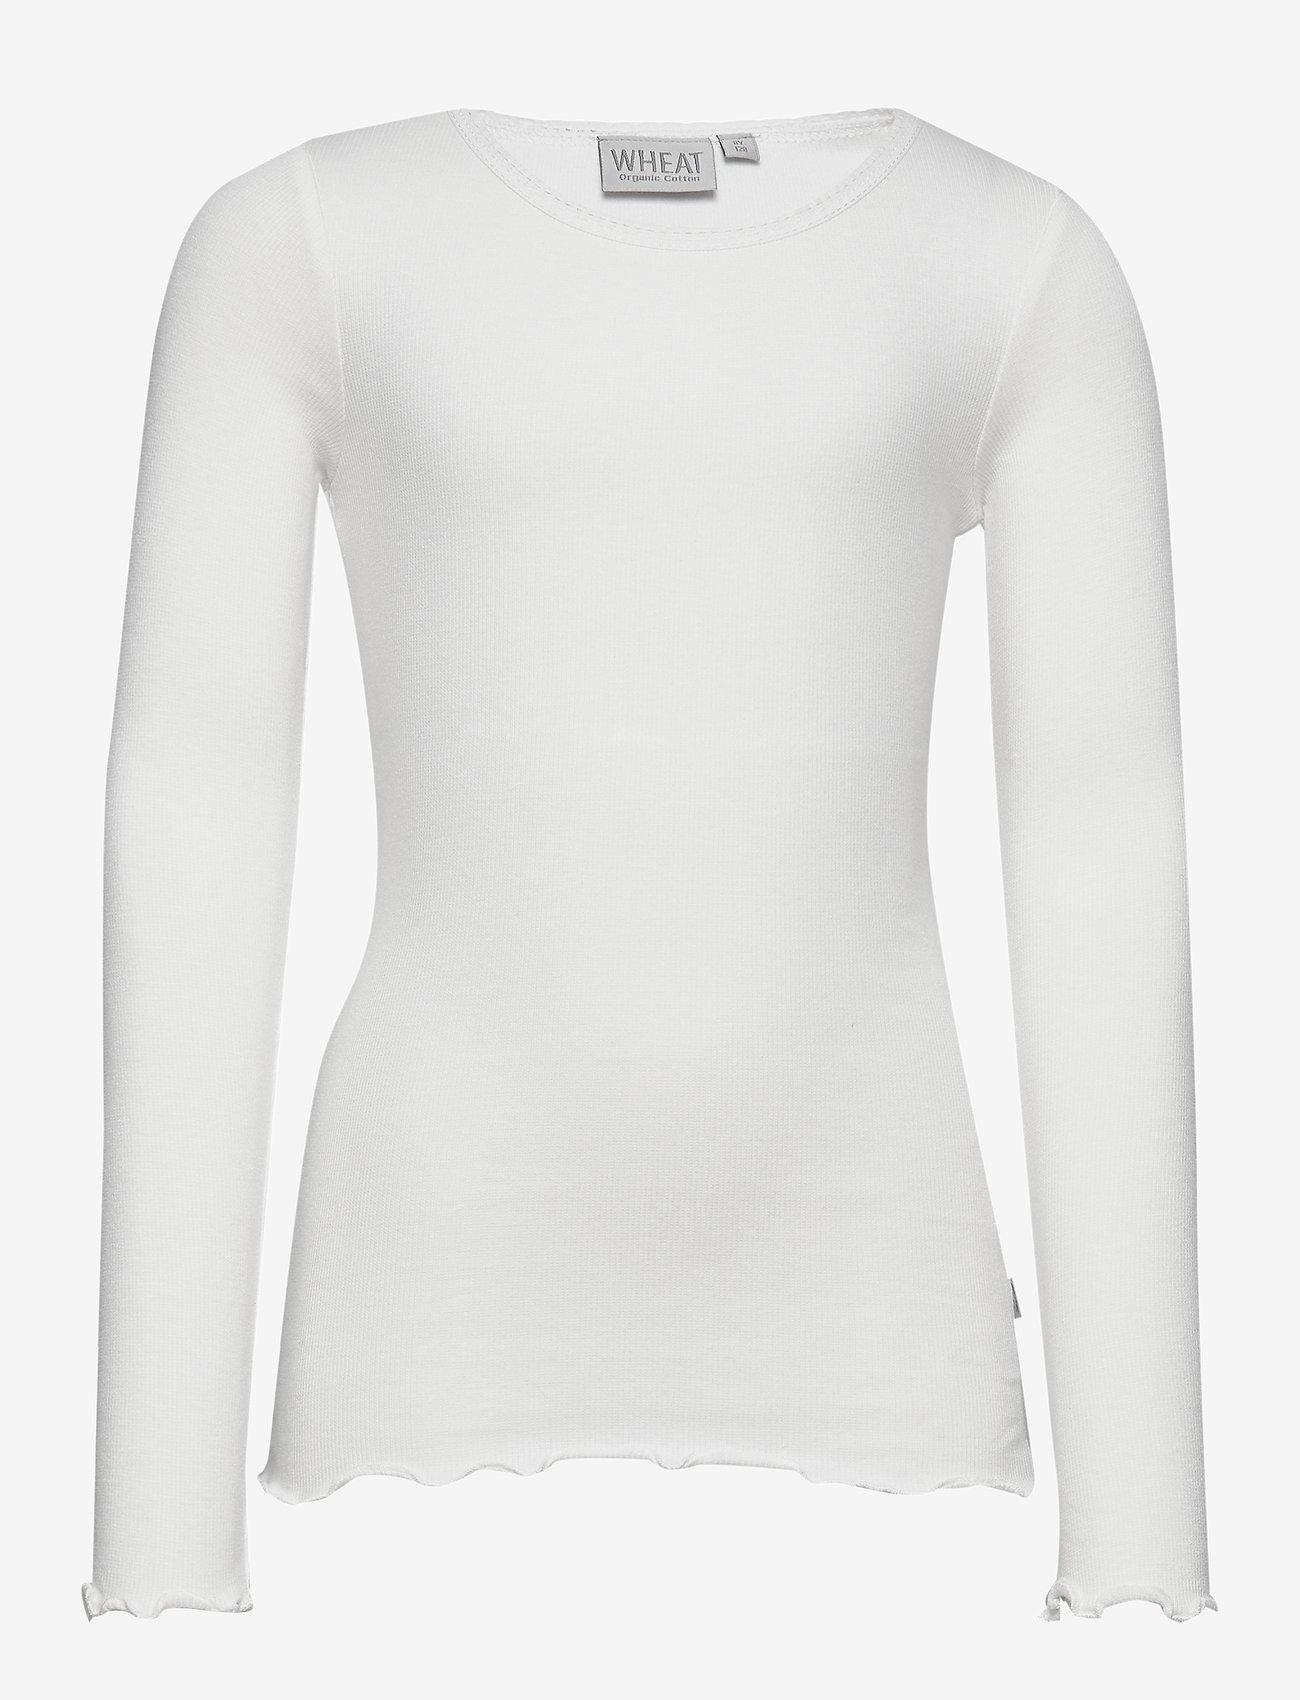 Wheat - Rib T-Shirt Lace LS - dlugi-rekaw - ivory